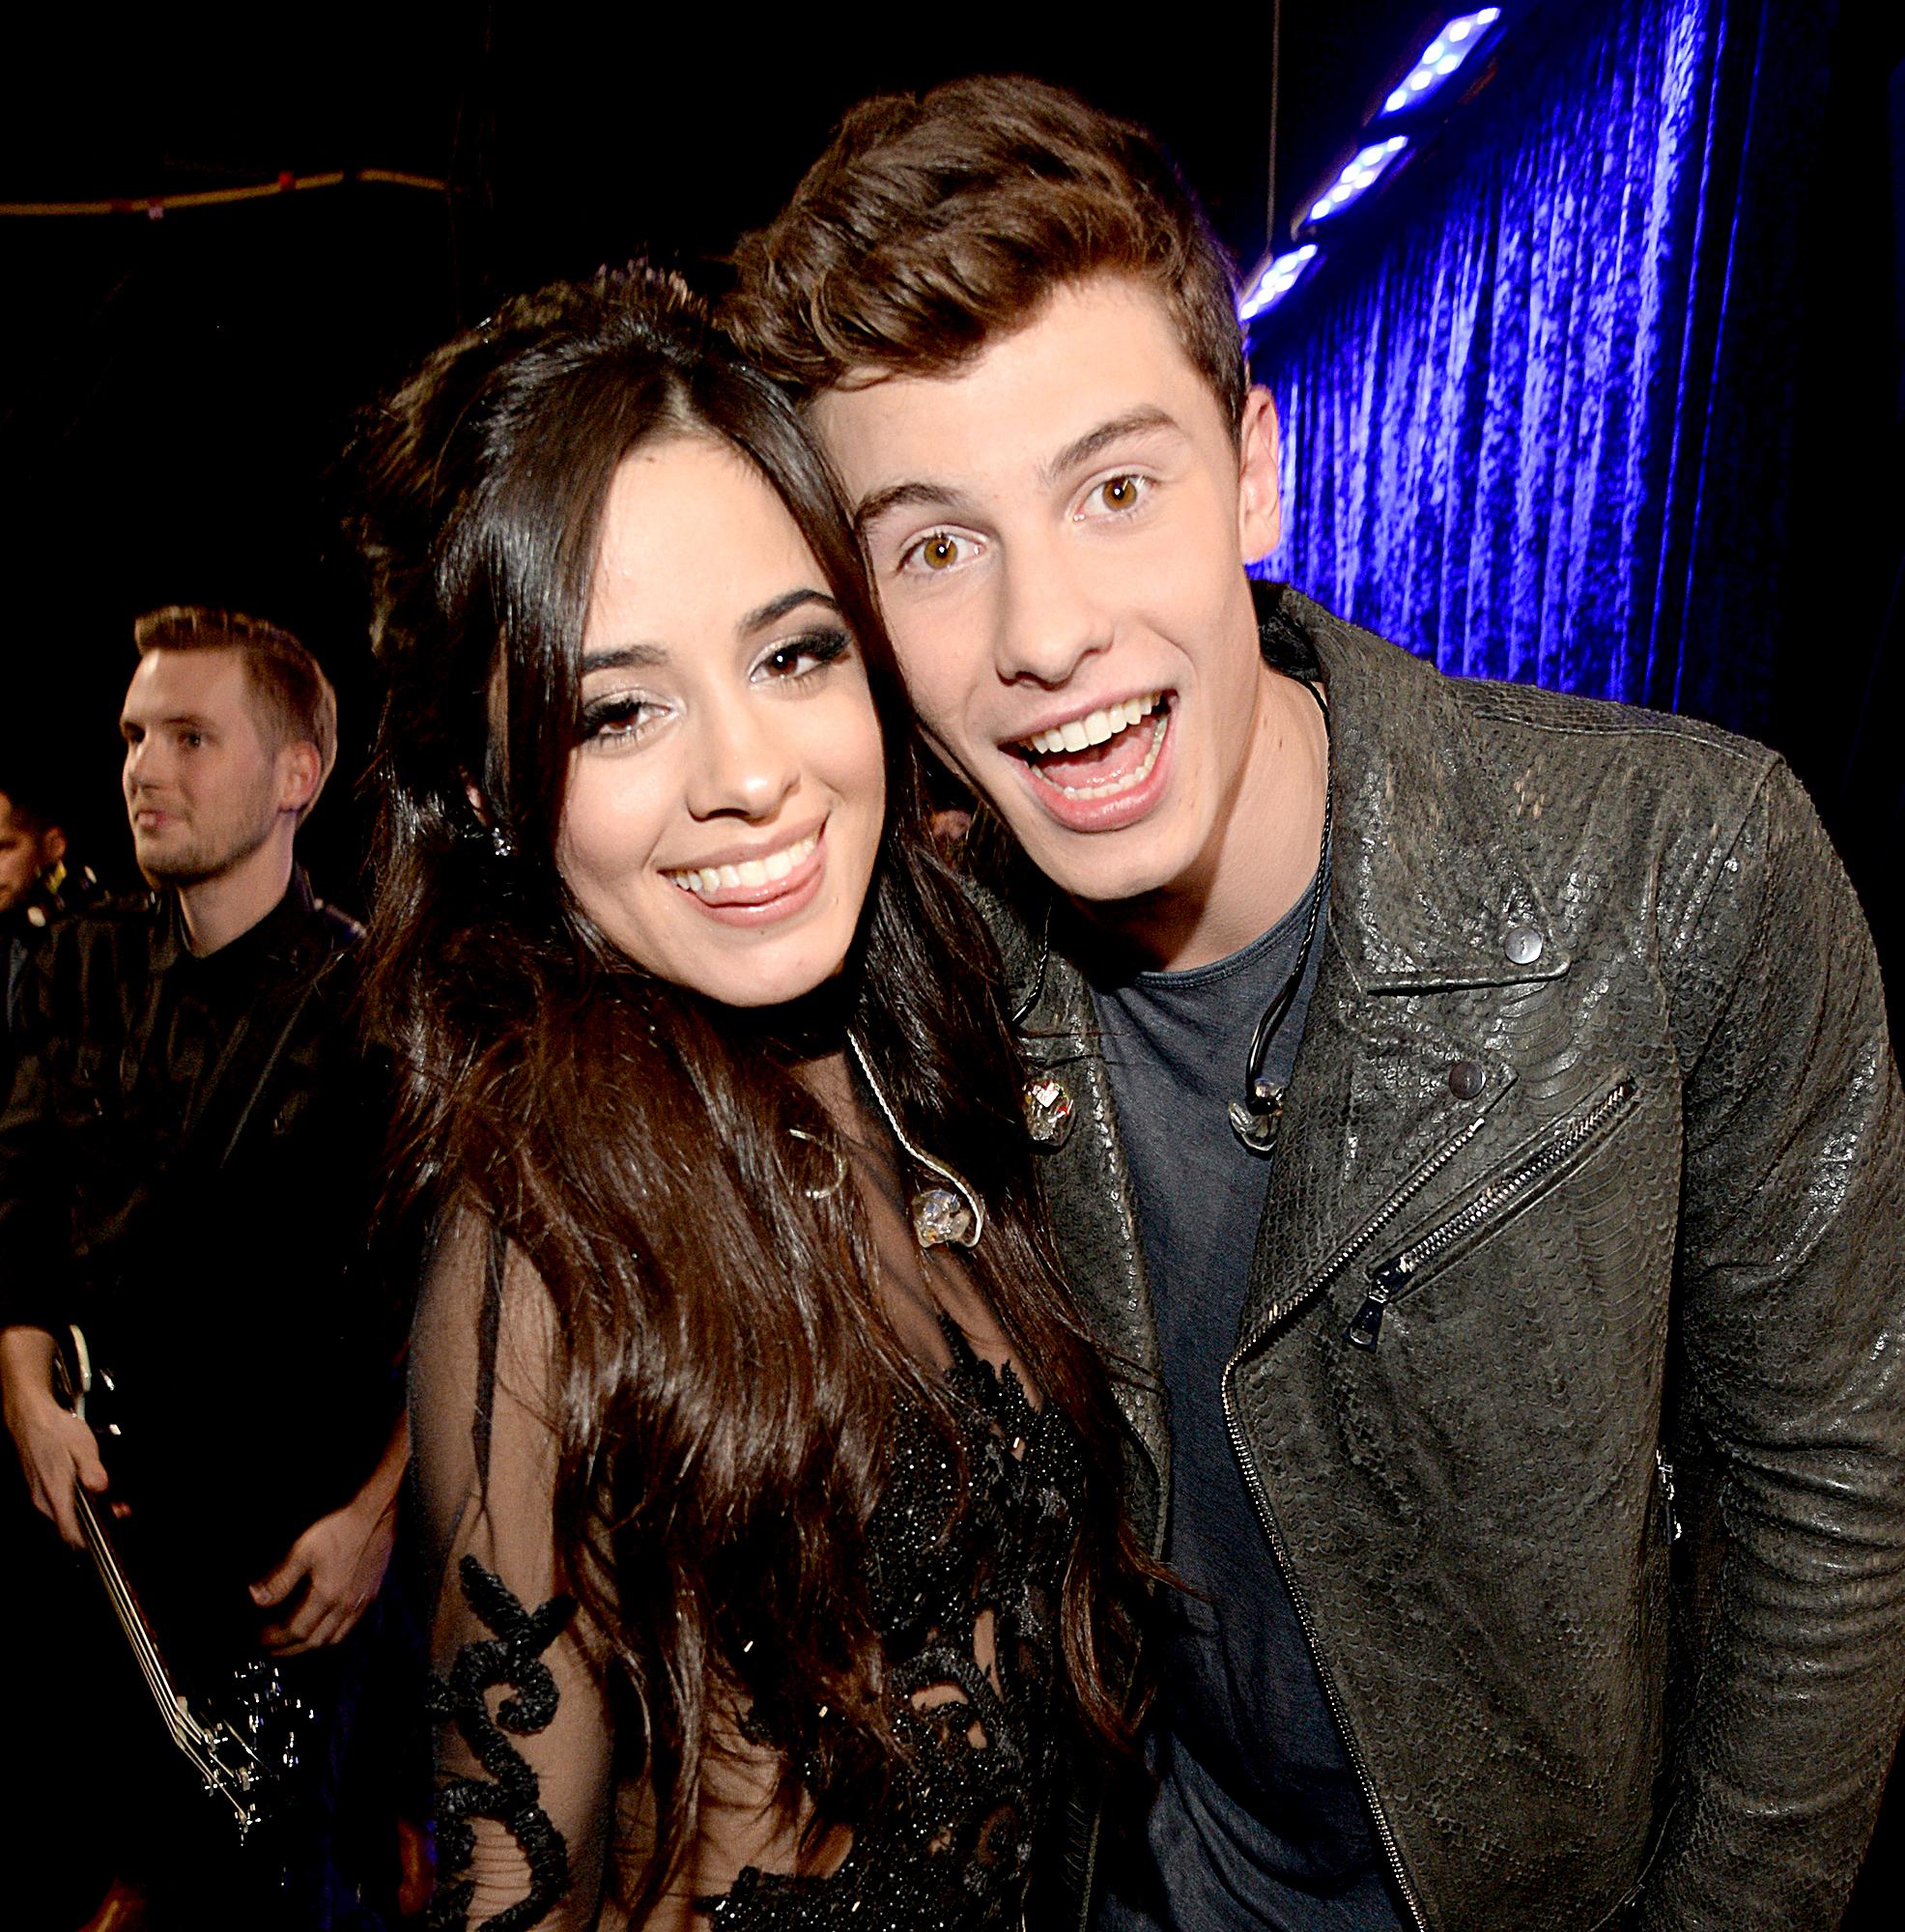 Shawn Mendes, Camila Cabello Drop 'Senorita' Music Video